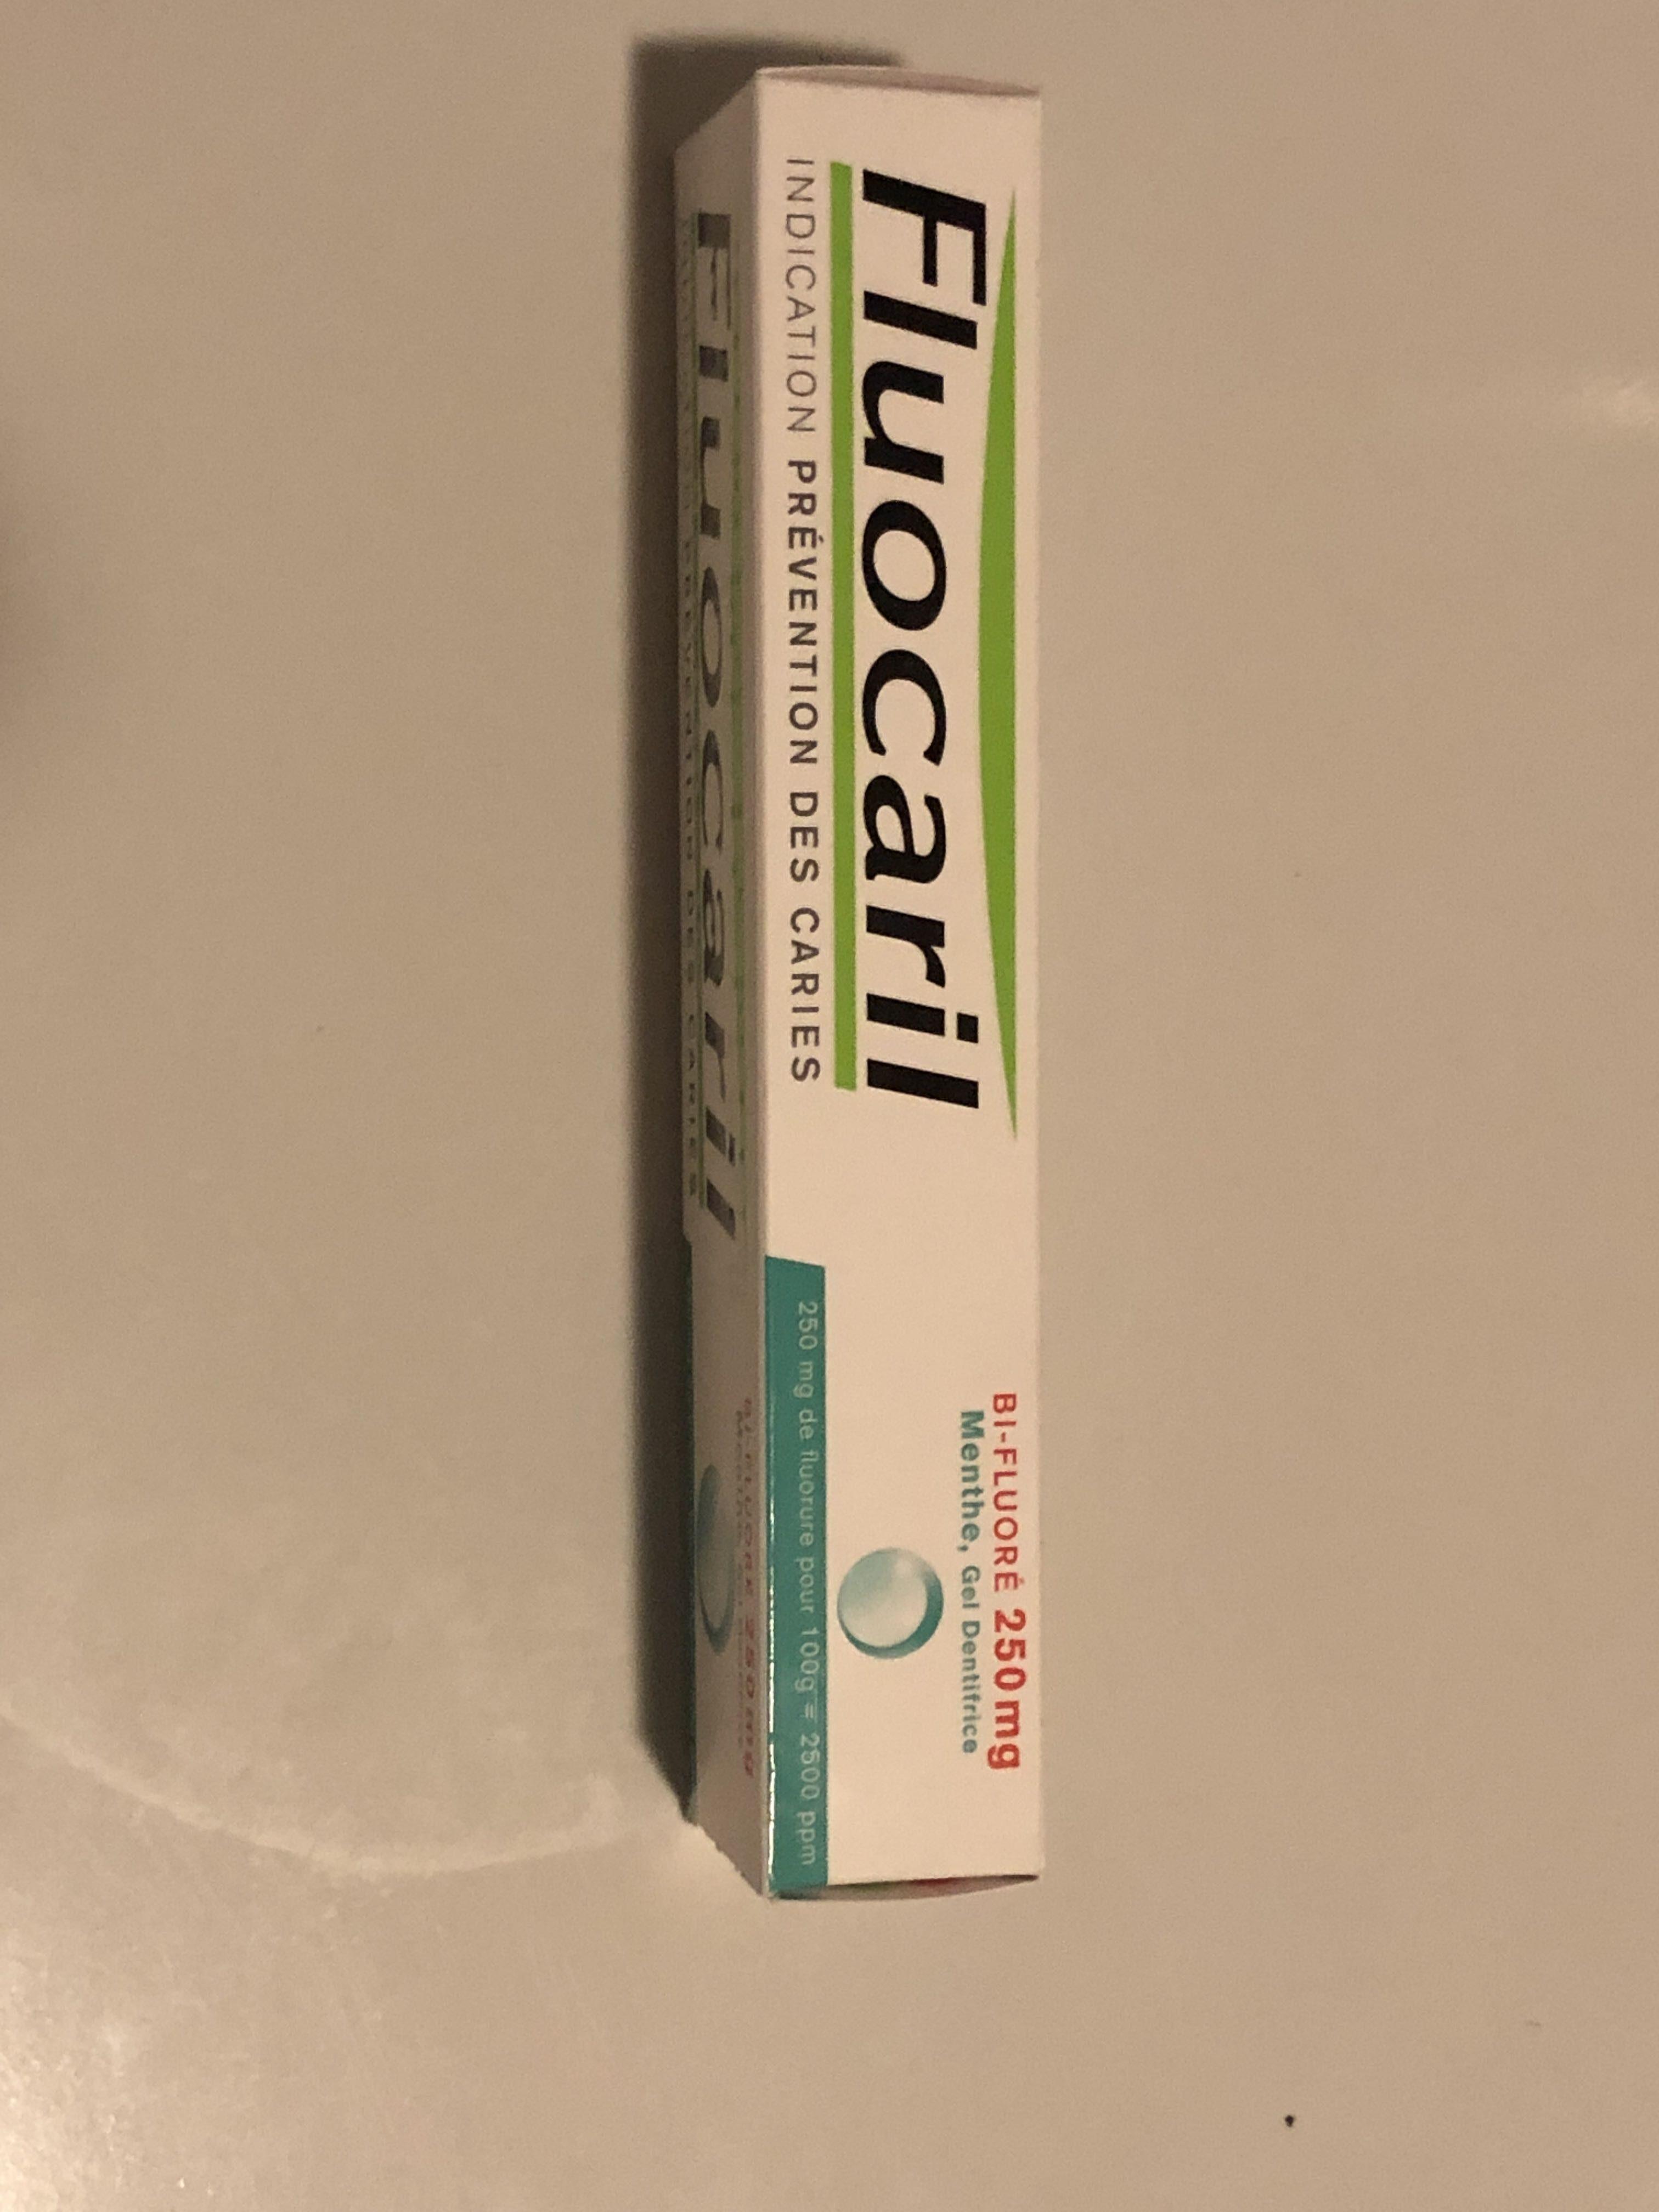 Gel dentifrice menthe bi-fluoré - Product - fr